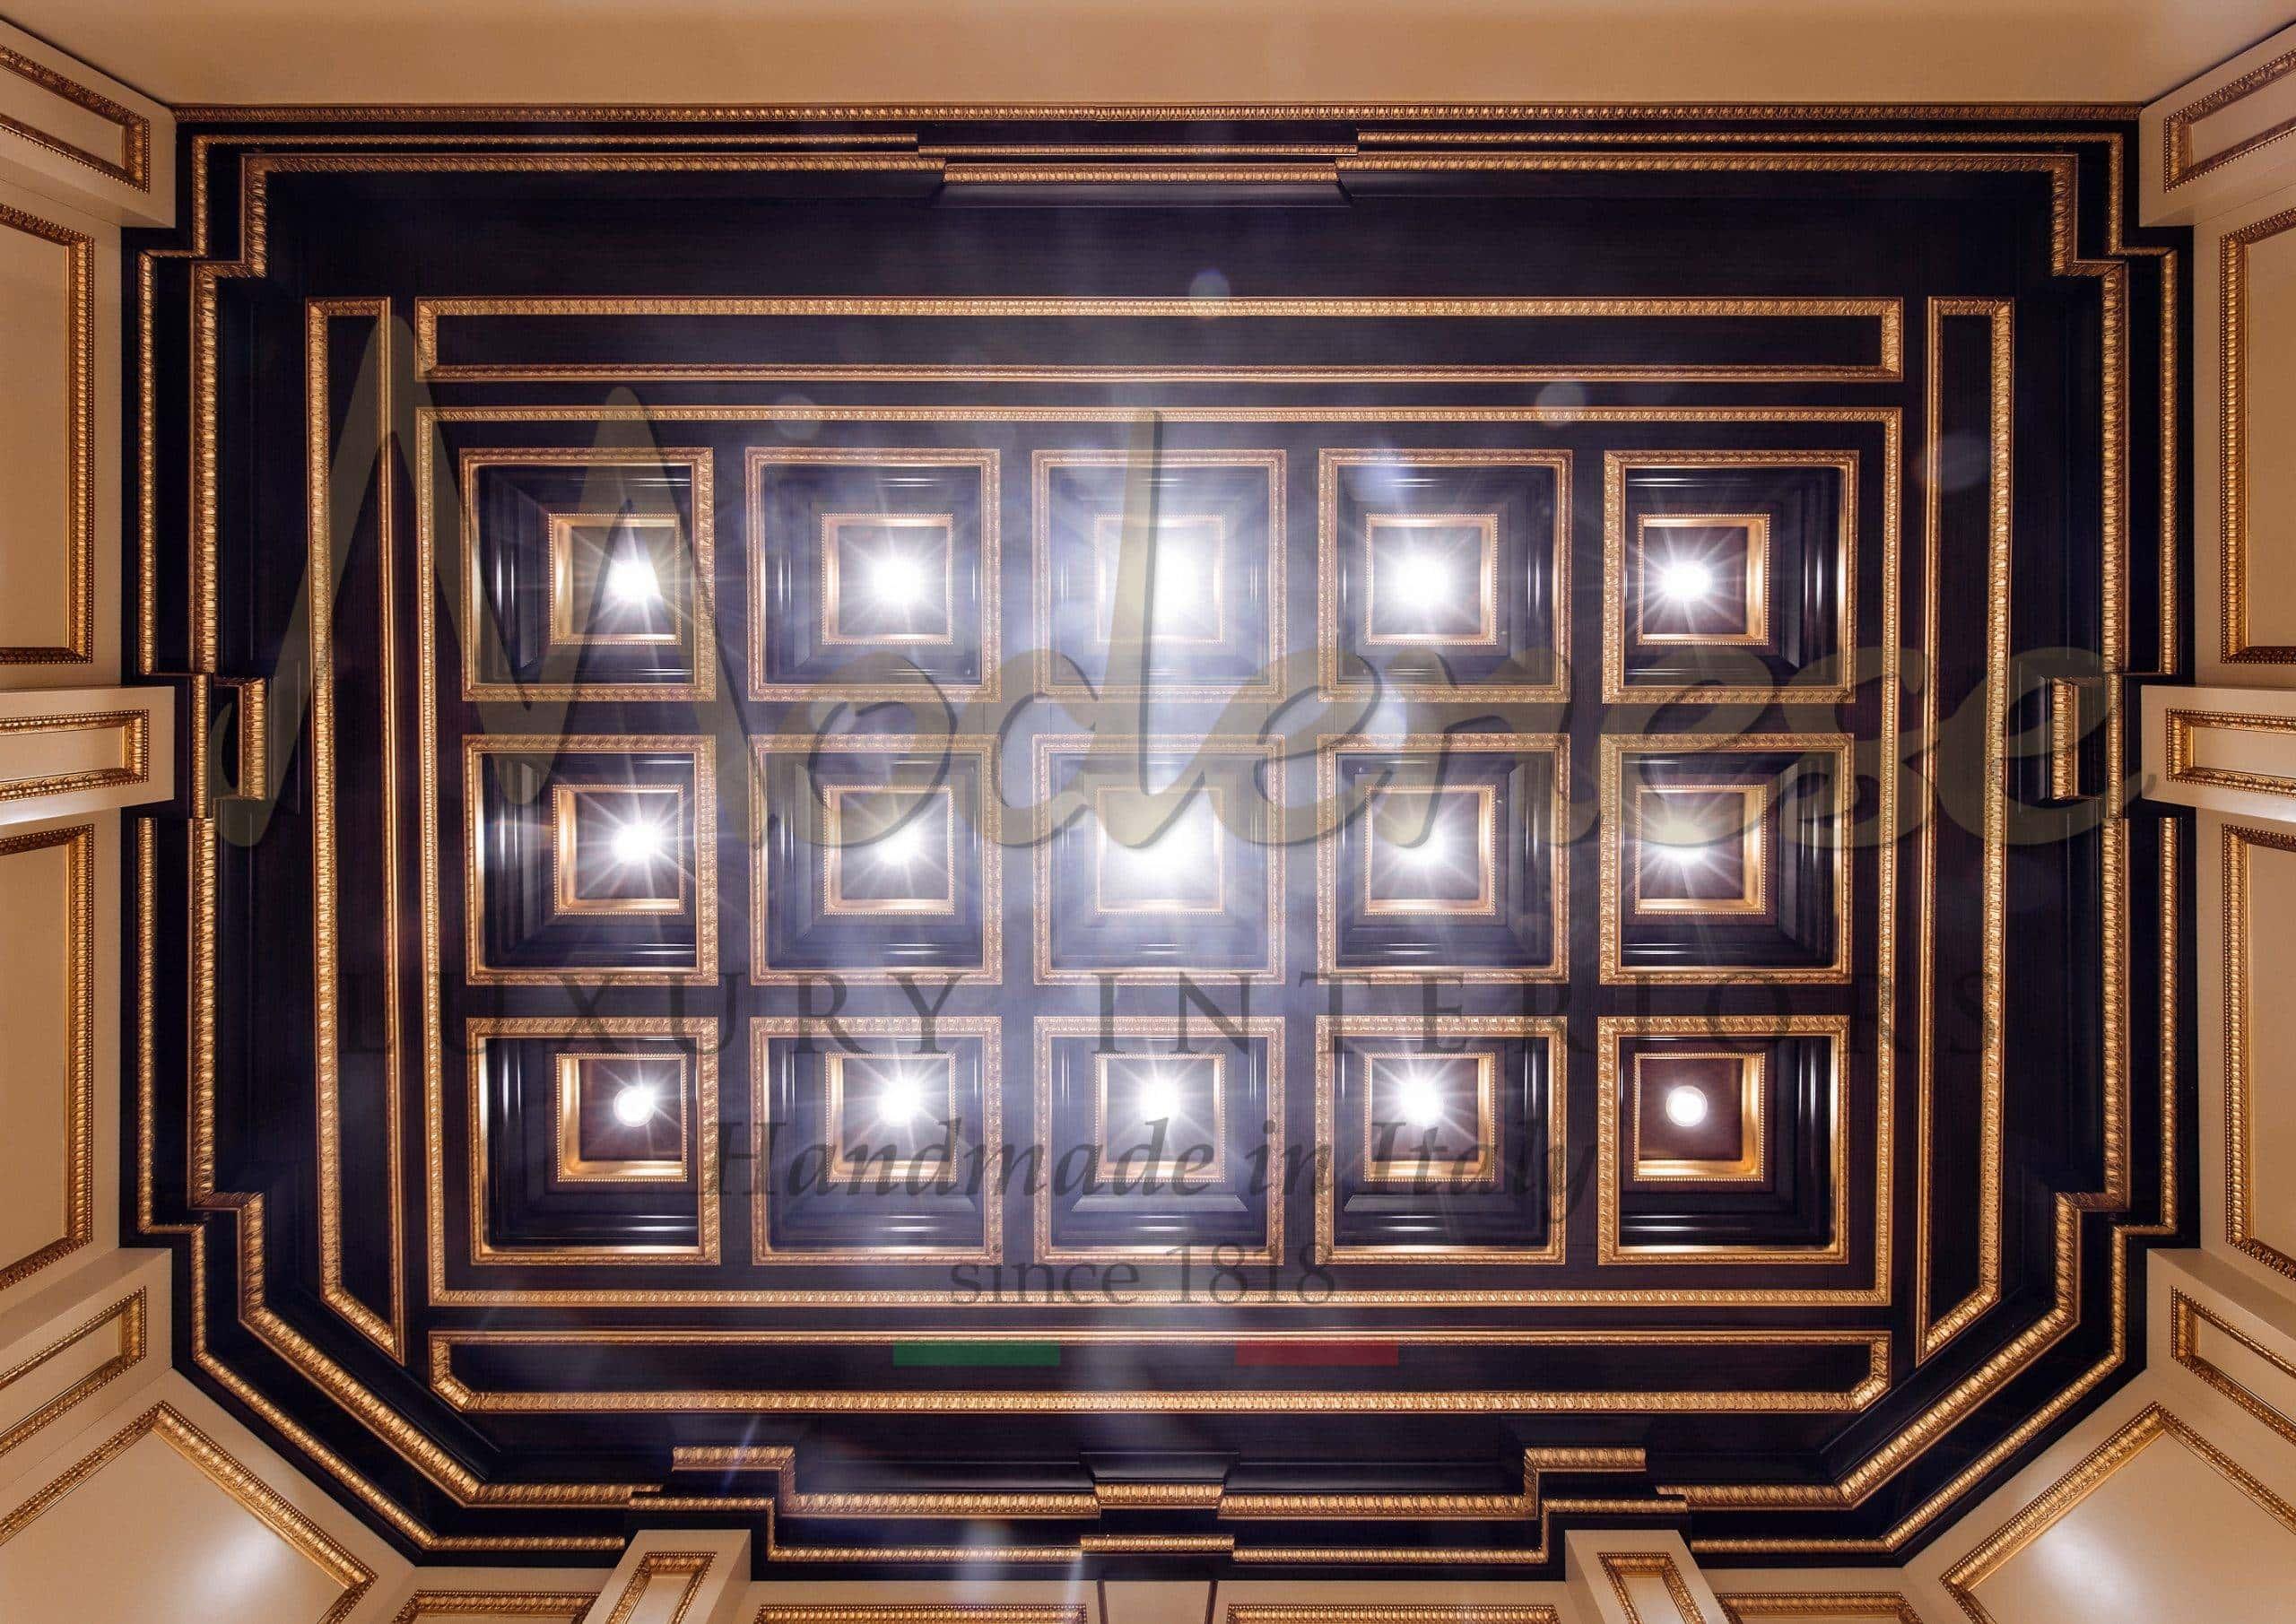 interior design service golden details opulent baroque style italian decoration consultant royal elegant luxury classic wooden ceiling refined home decorations